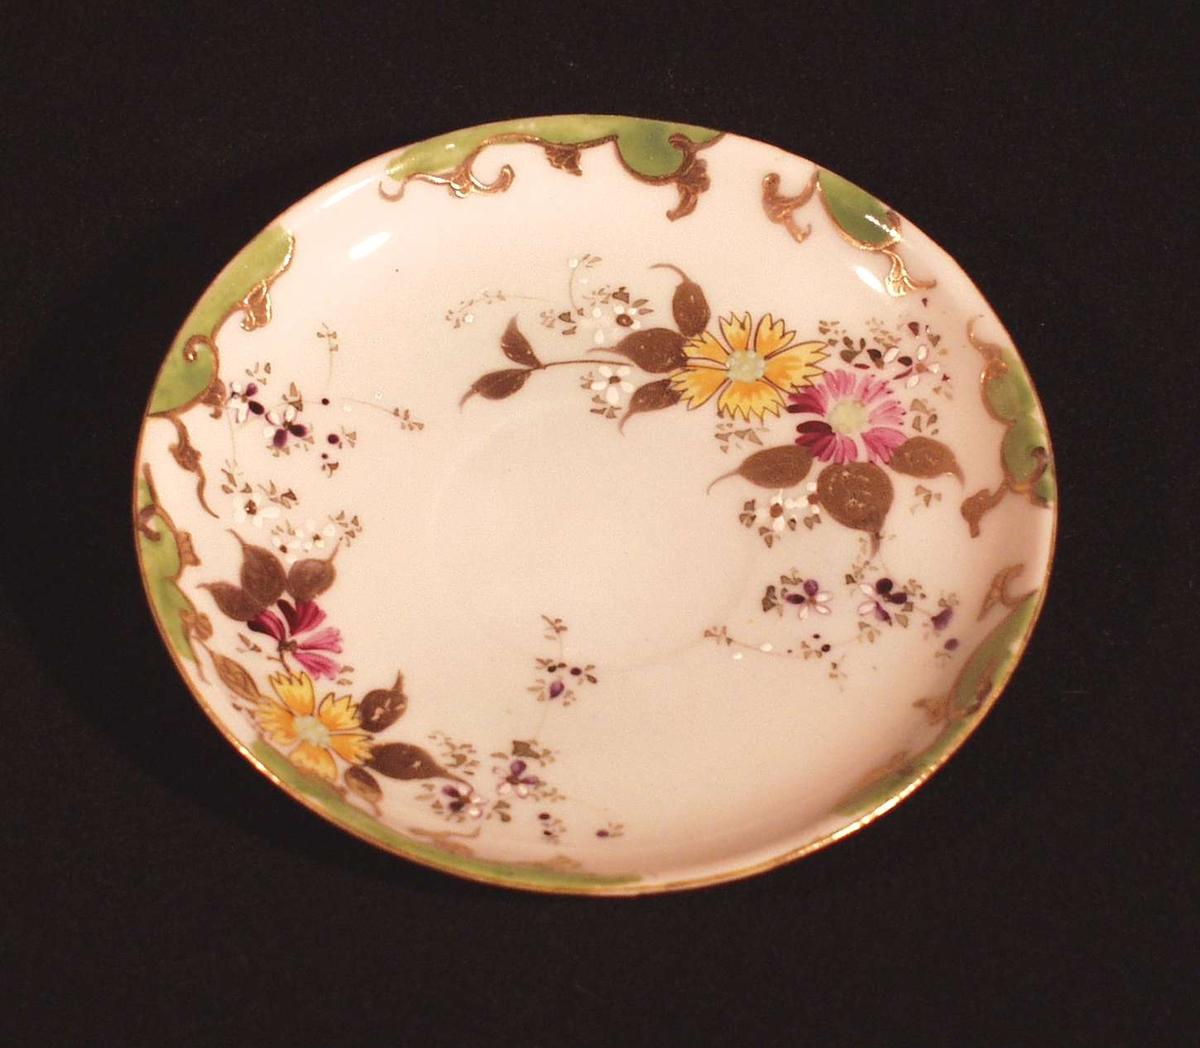 Rund skål med opphøyet dekor (blomstermotiv).